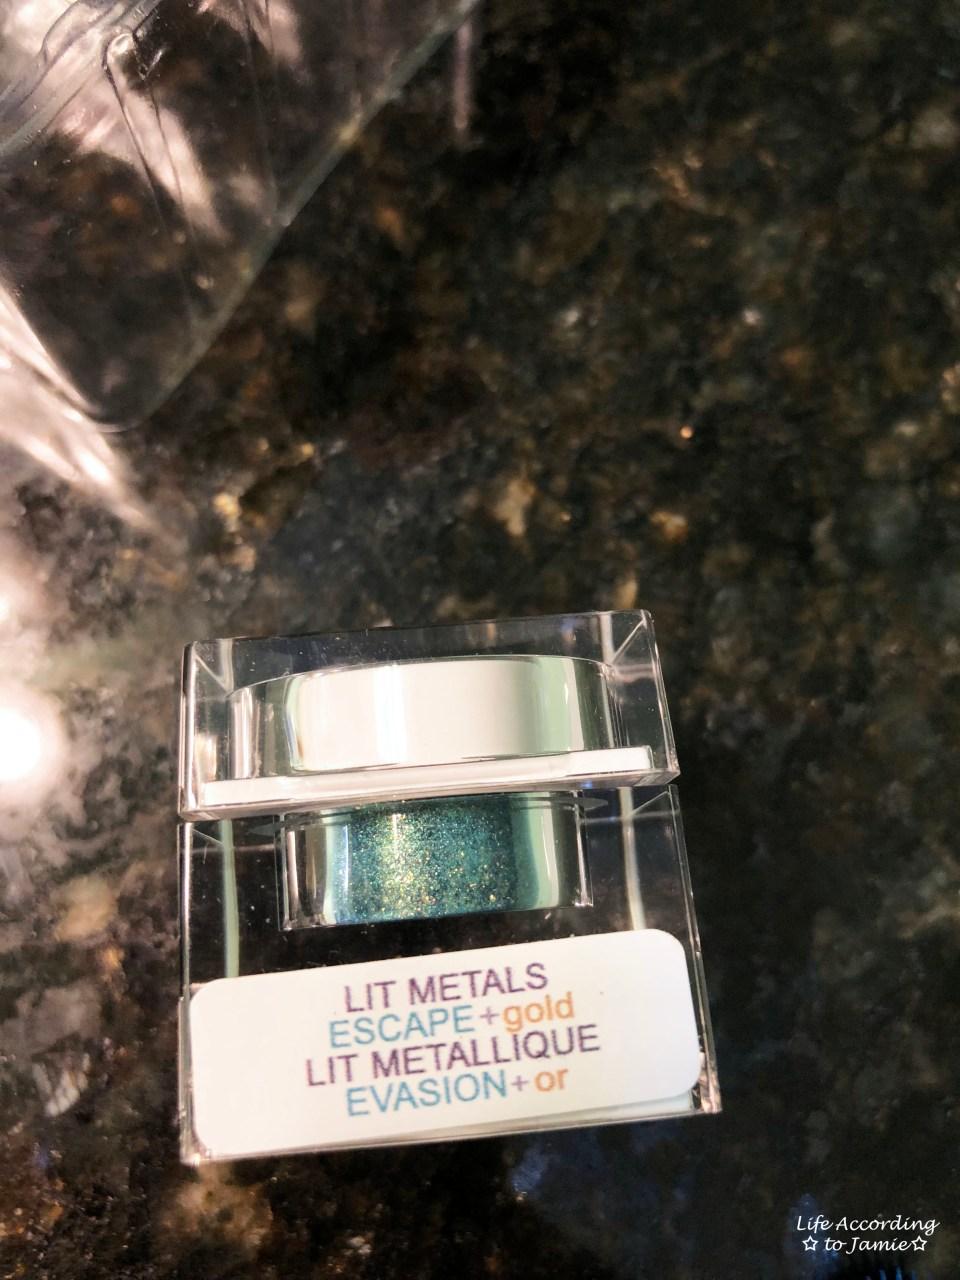 Lit Cosmetics - Escape + Gold